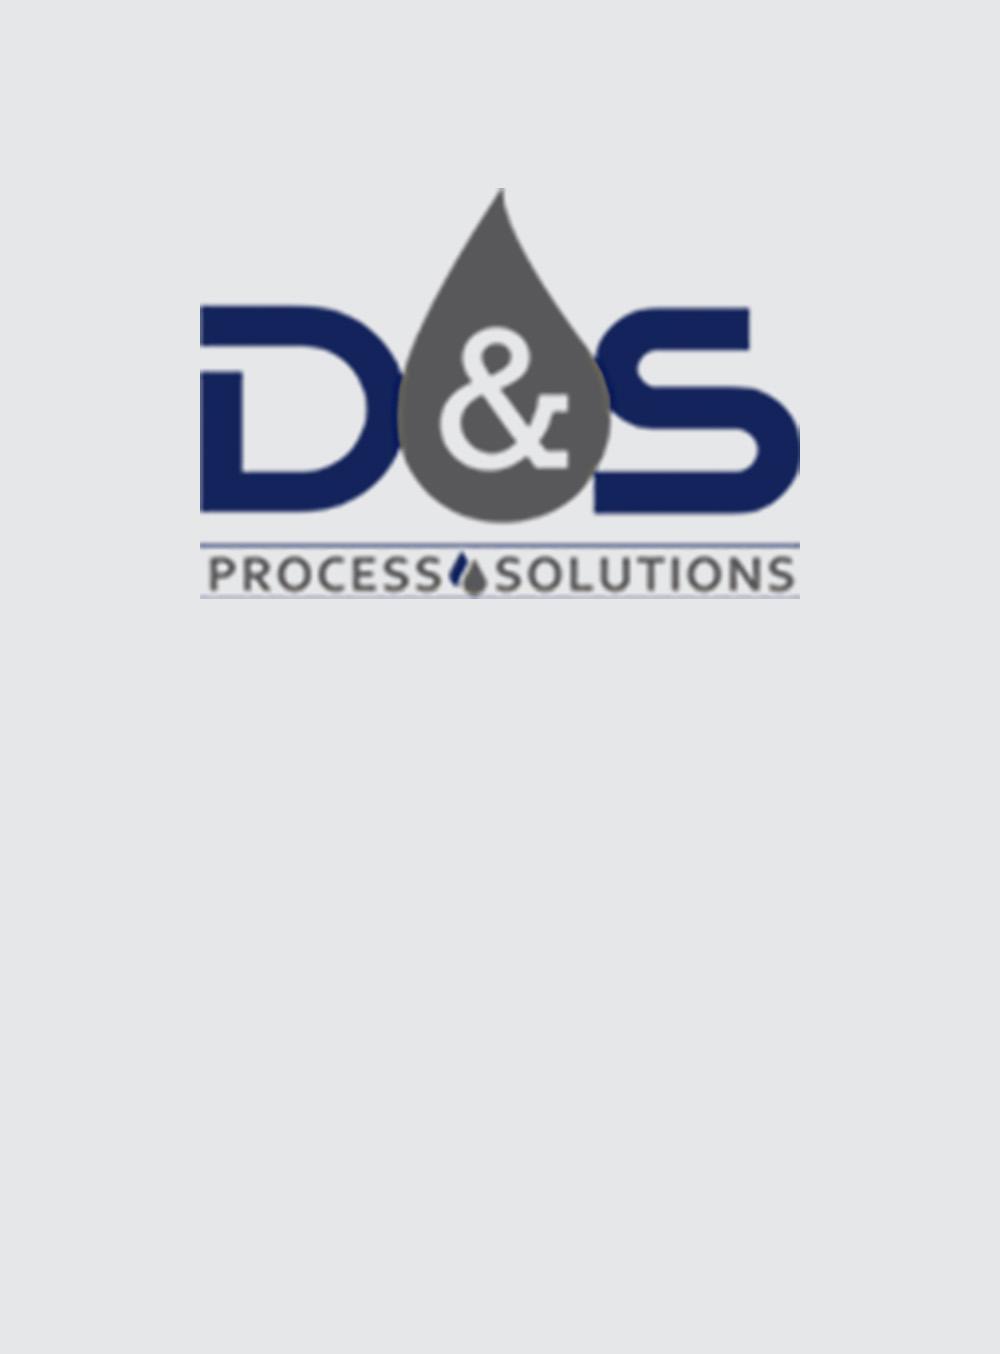 Logo D&S process Solutions